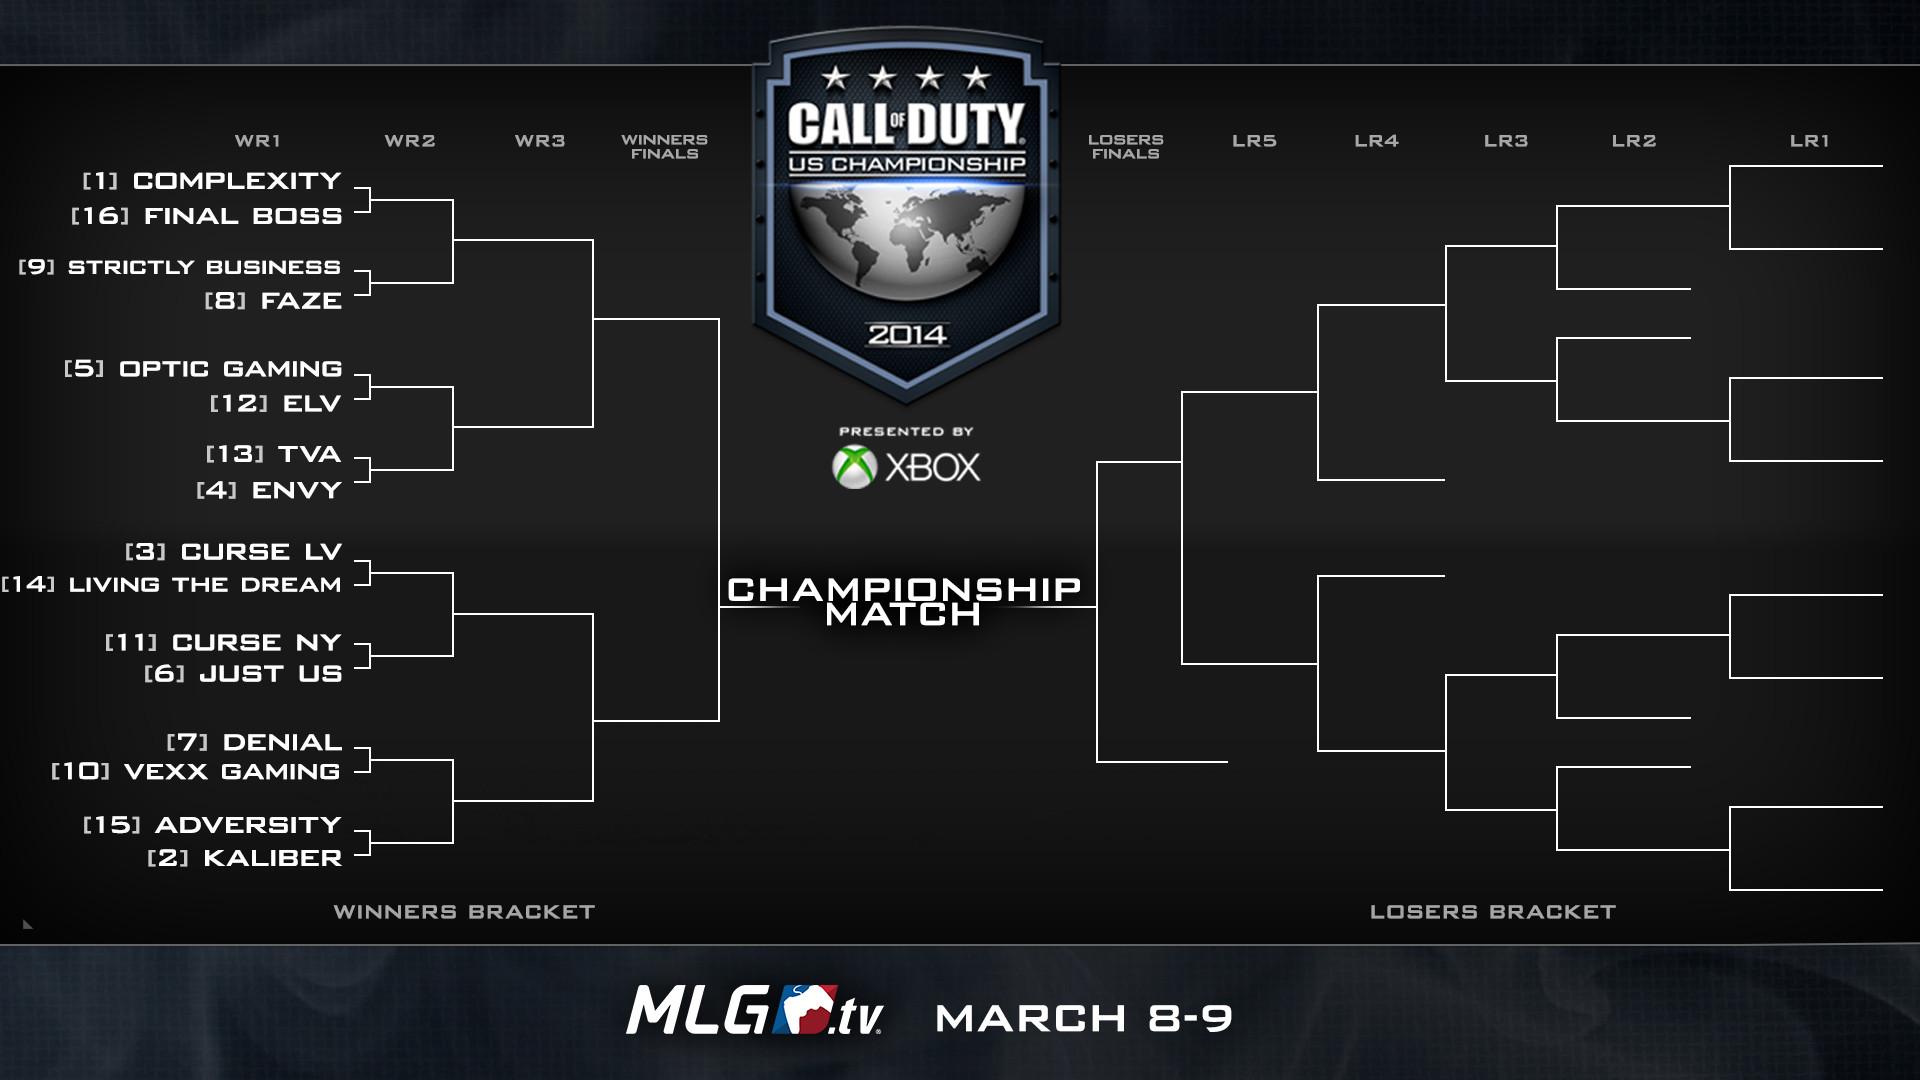 Call of Duty US Championship Bracket